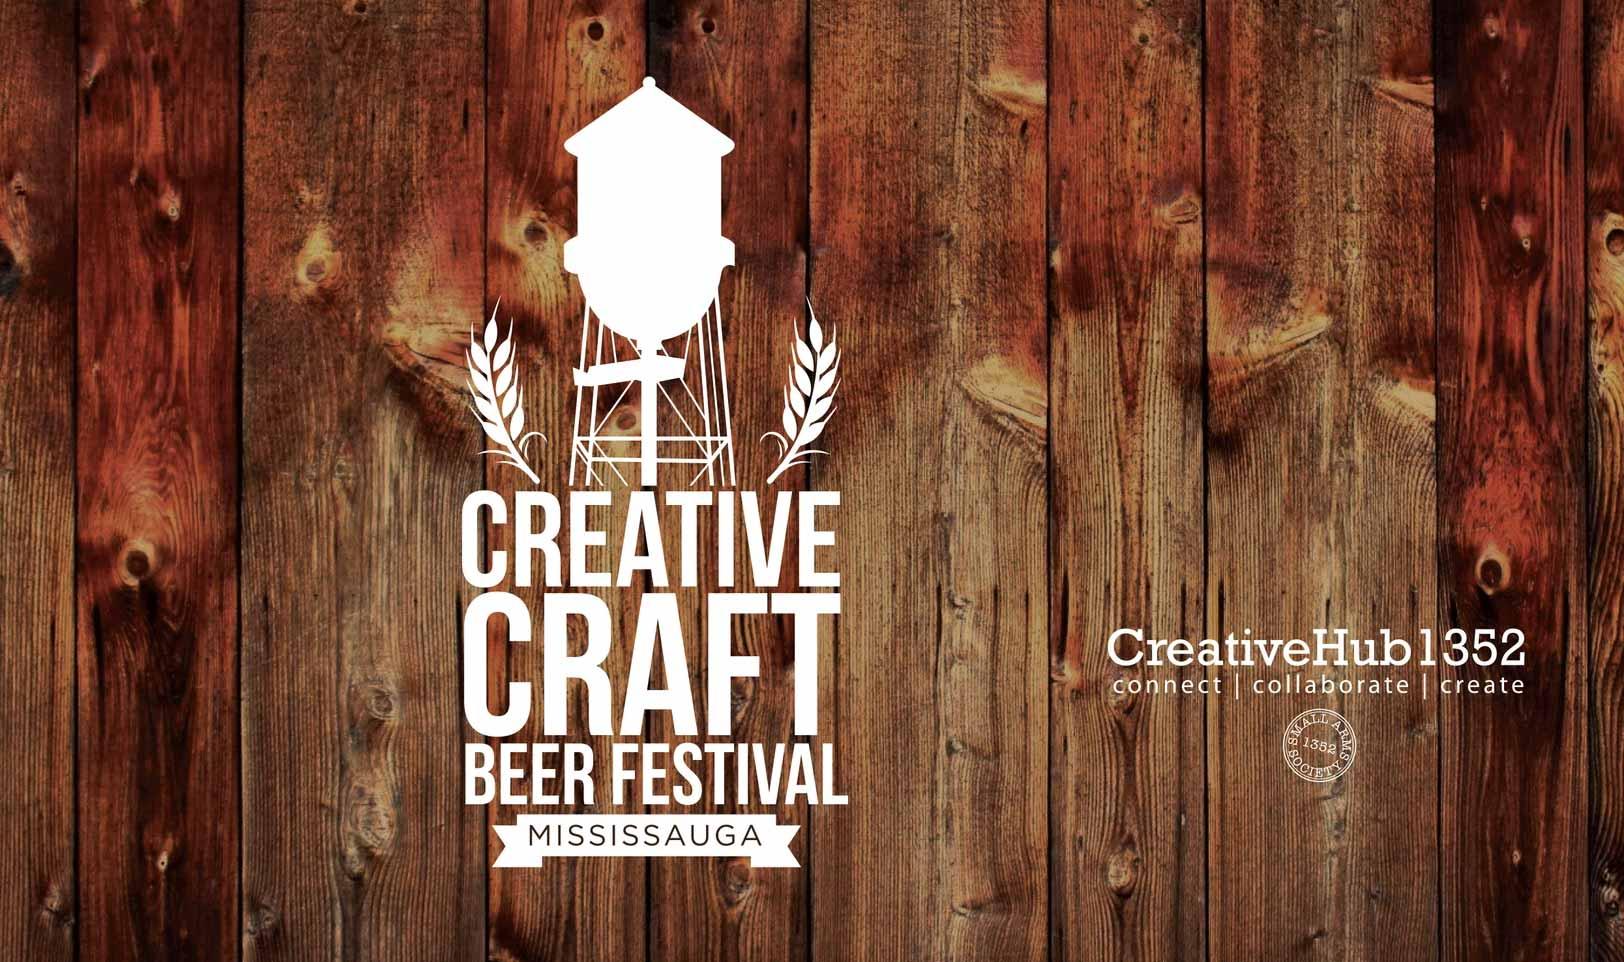 Mississauga Creative Craft Beer Festival